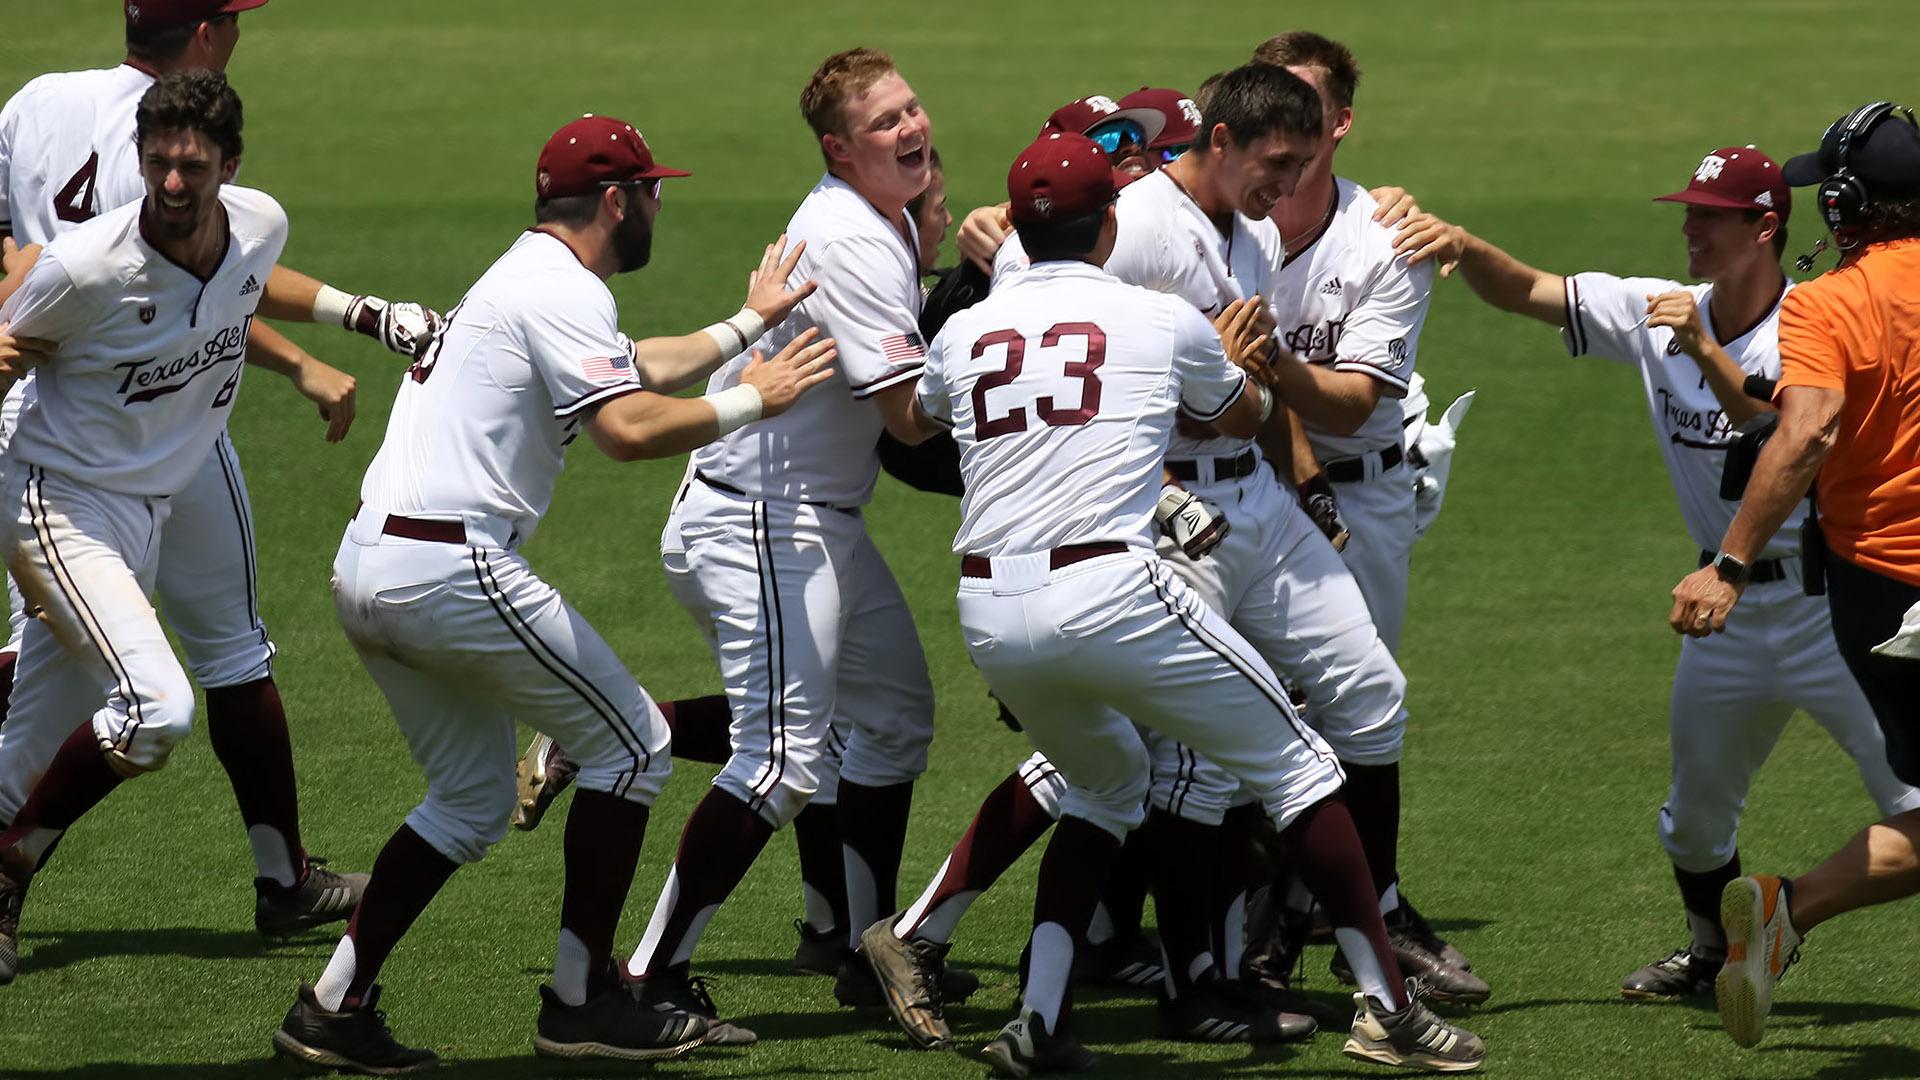 Texas A&M Baseball Walkoff.jpg